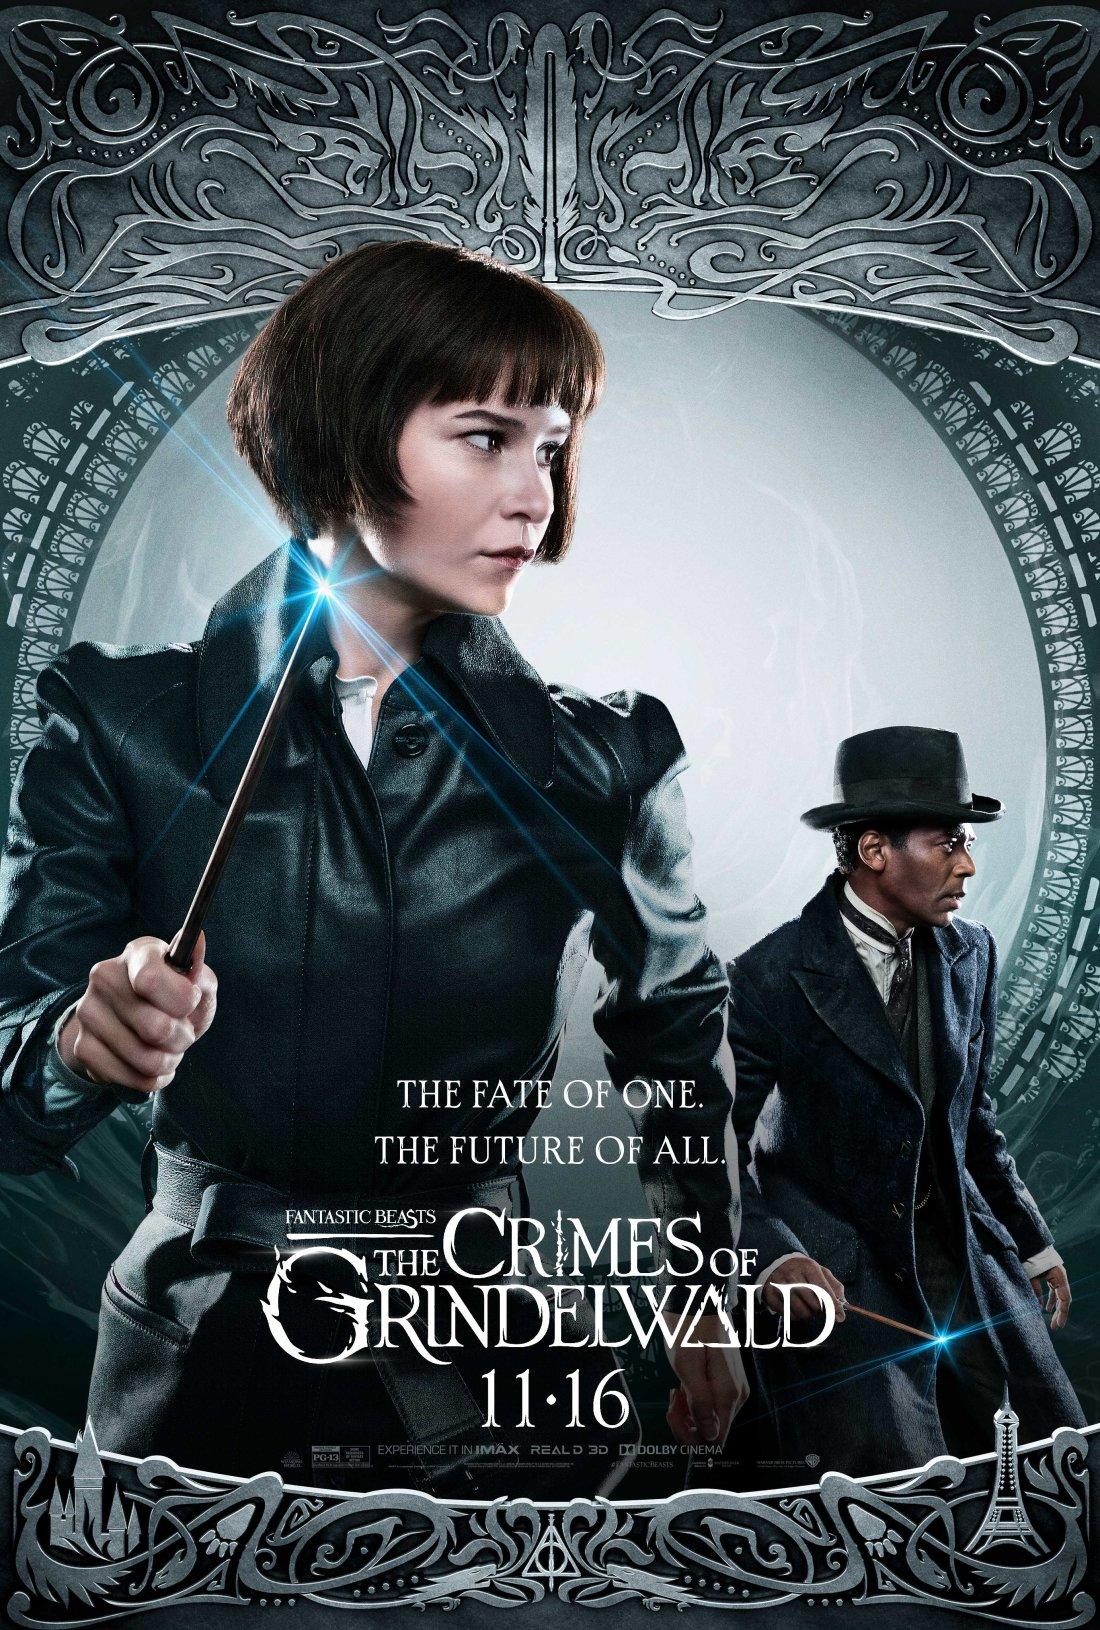 Poster de animais fantásticos os crimes de grindelwald